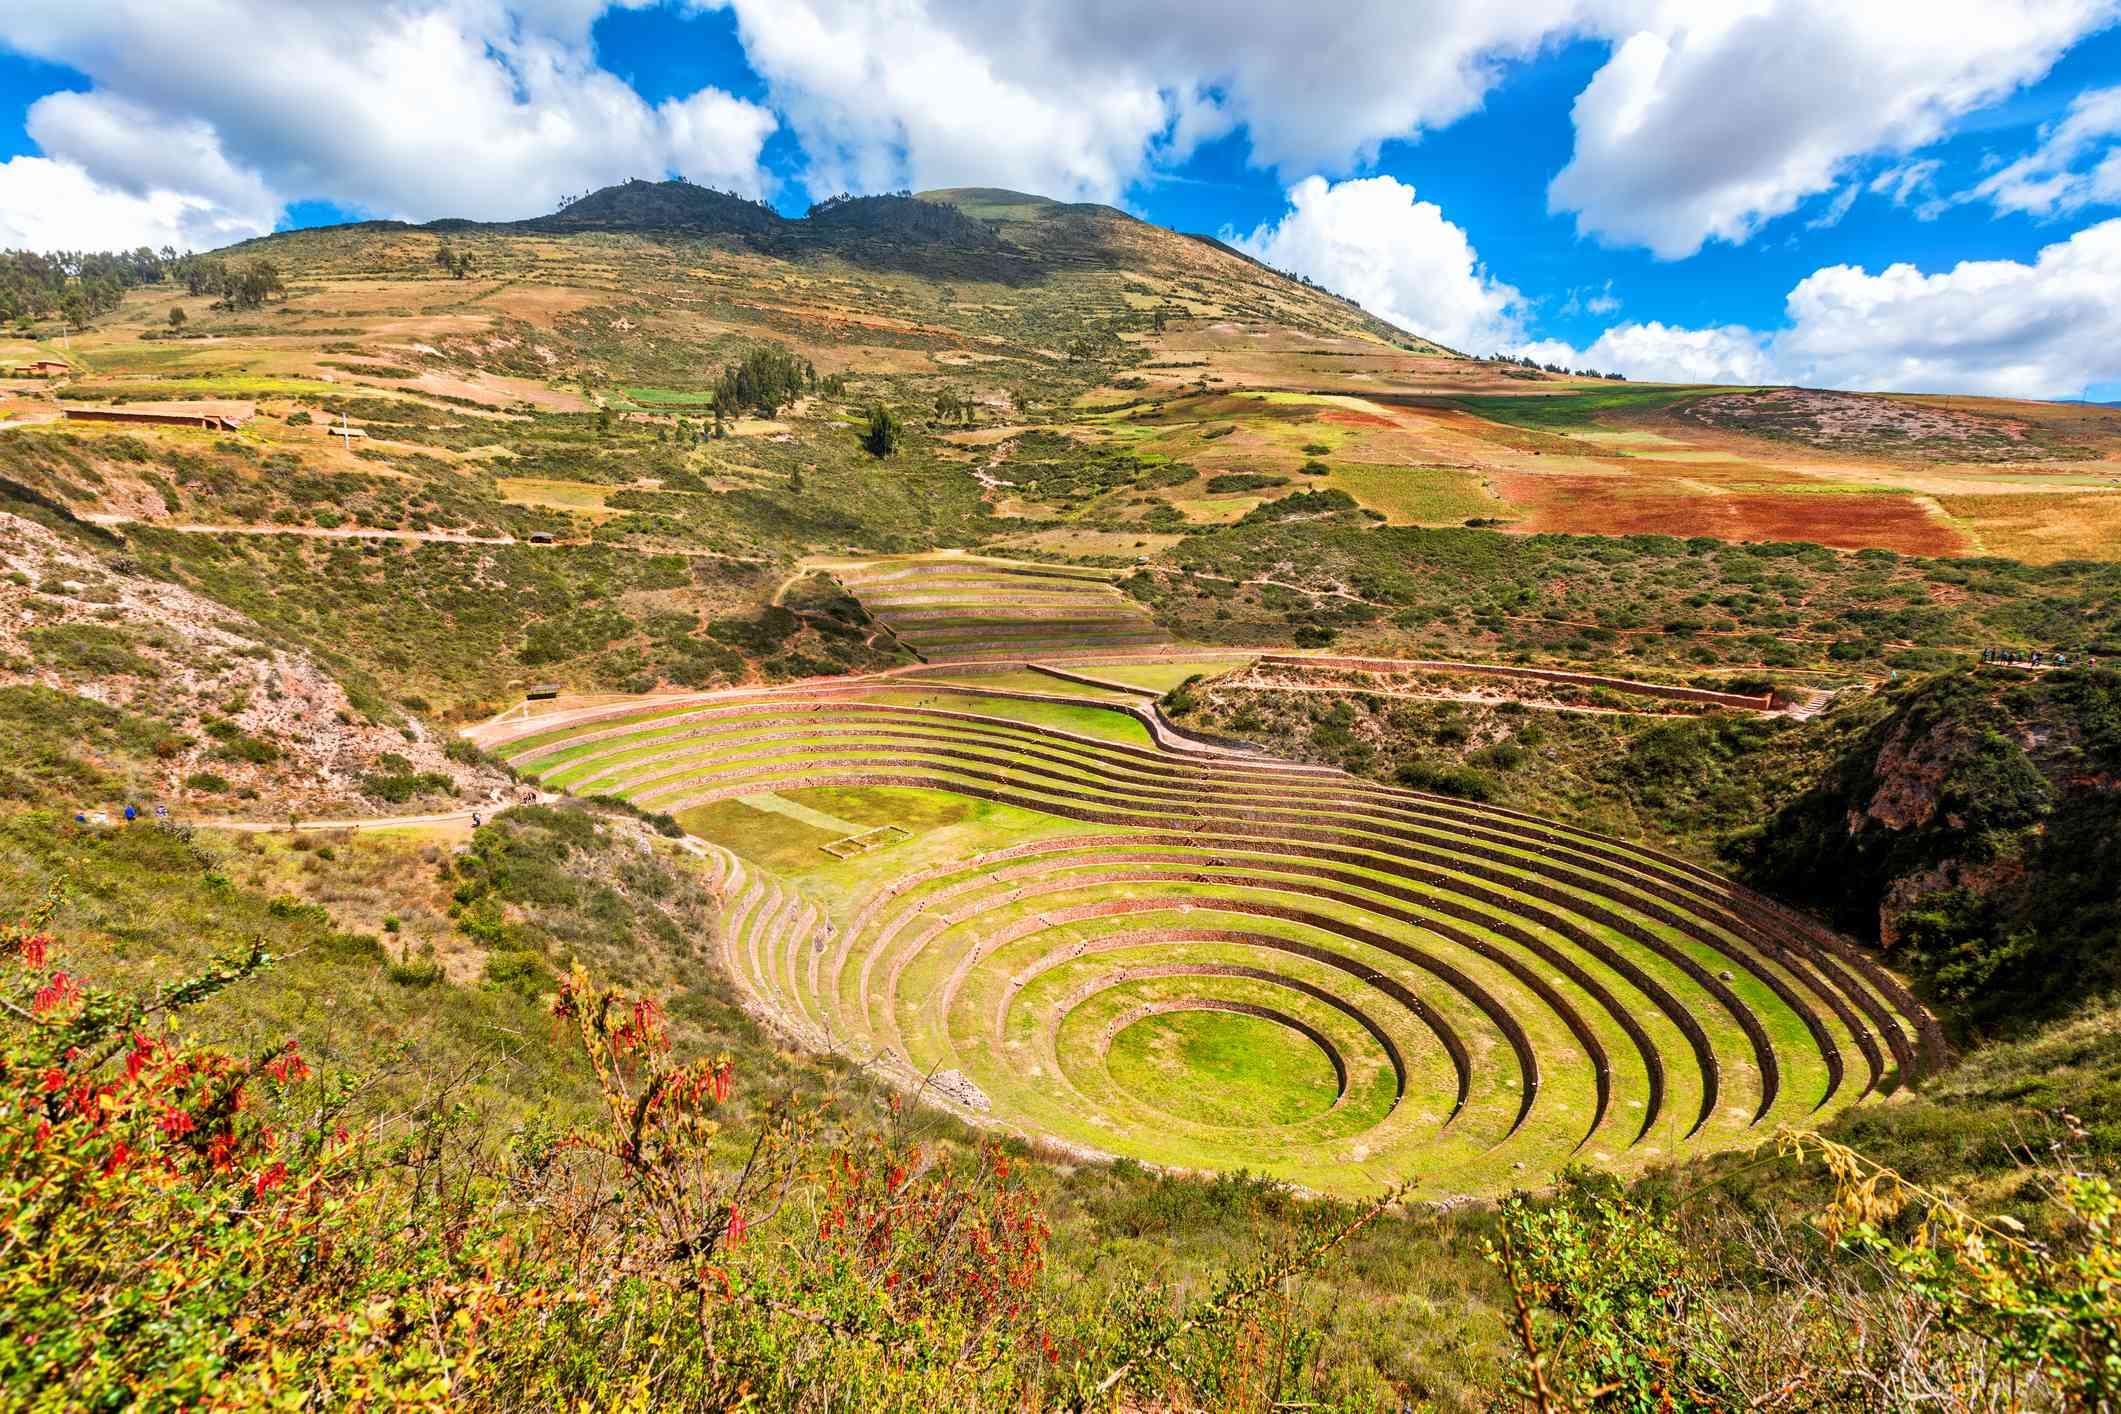 Agricultural terracing of Moray, Peru